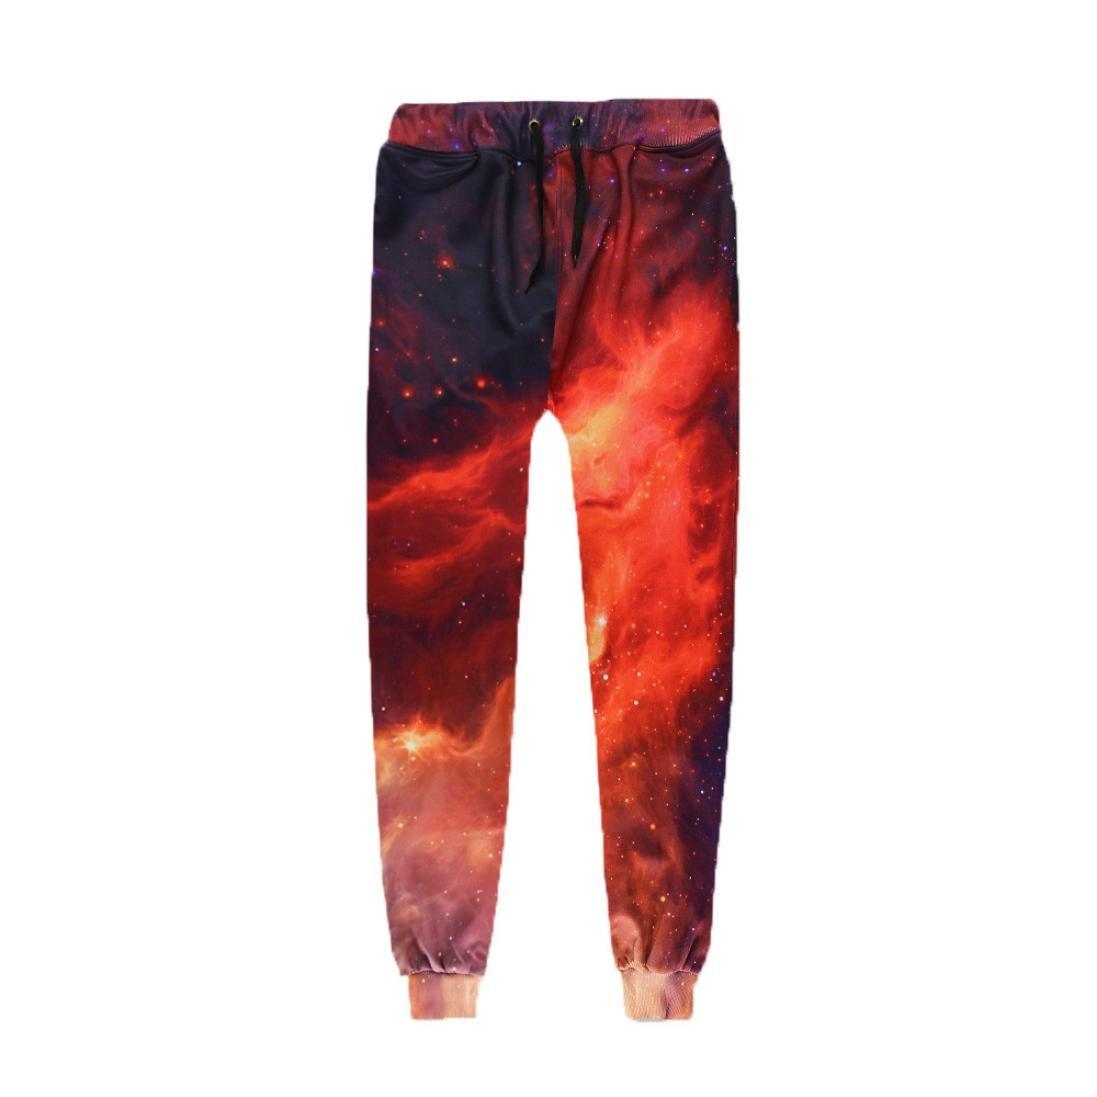 Allywit Pants Pocket Full Length 3D HD Print Men Joggers Pants Trousers